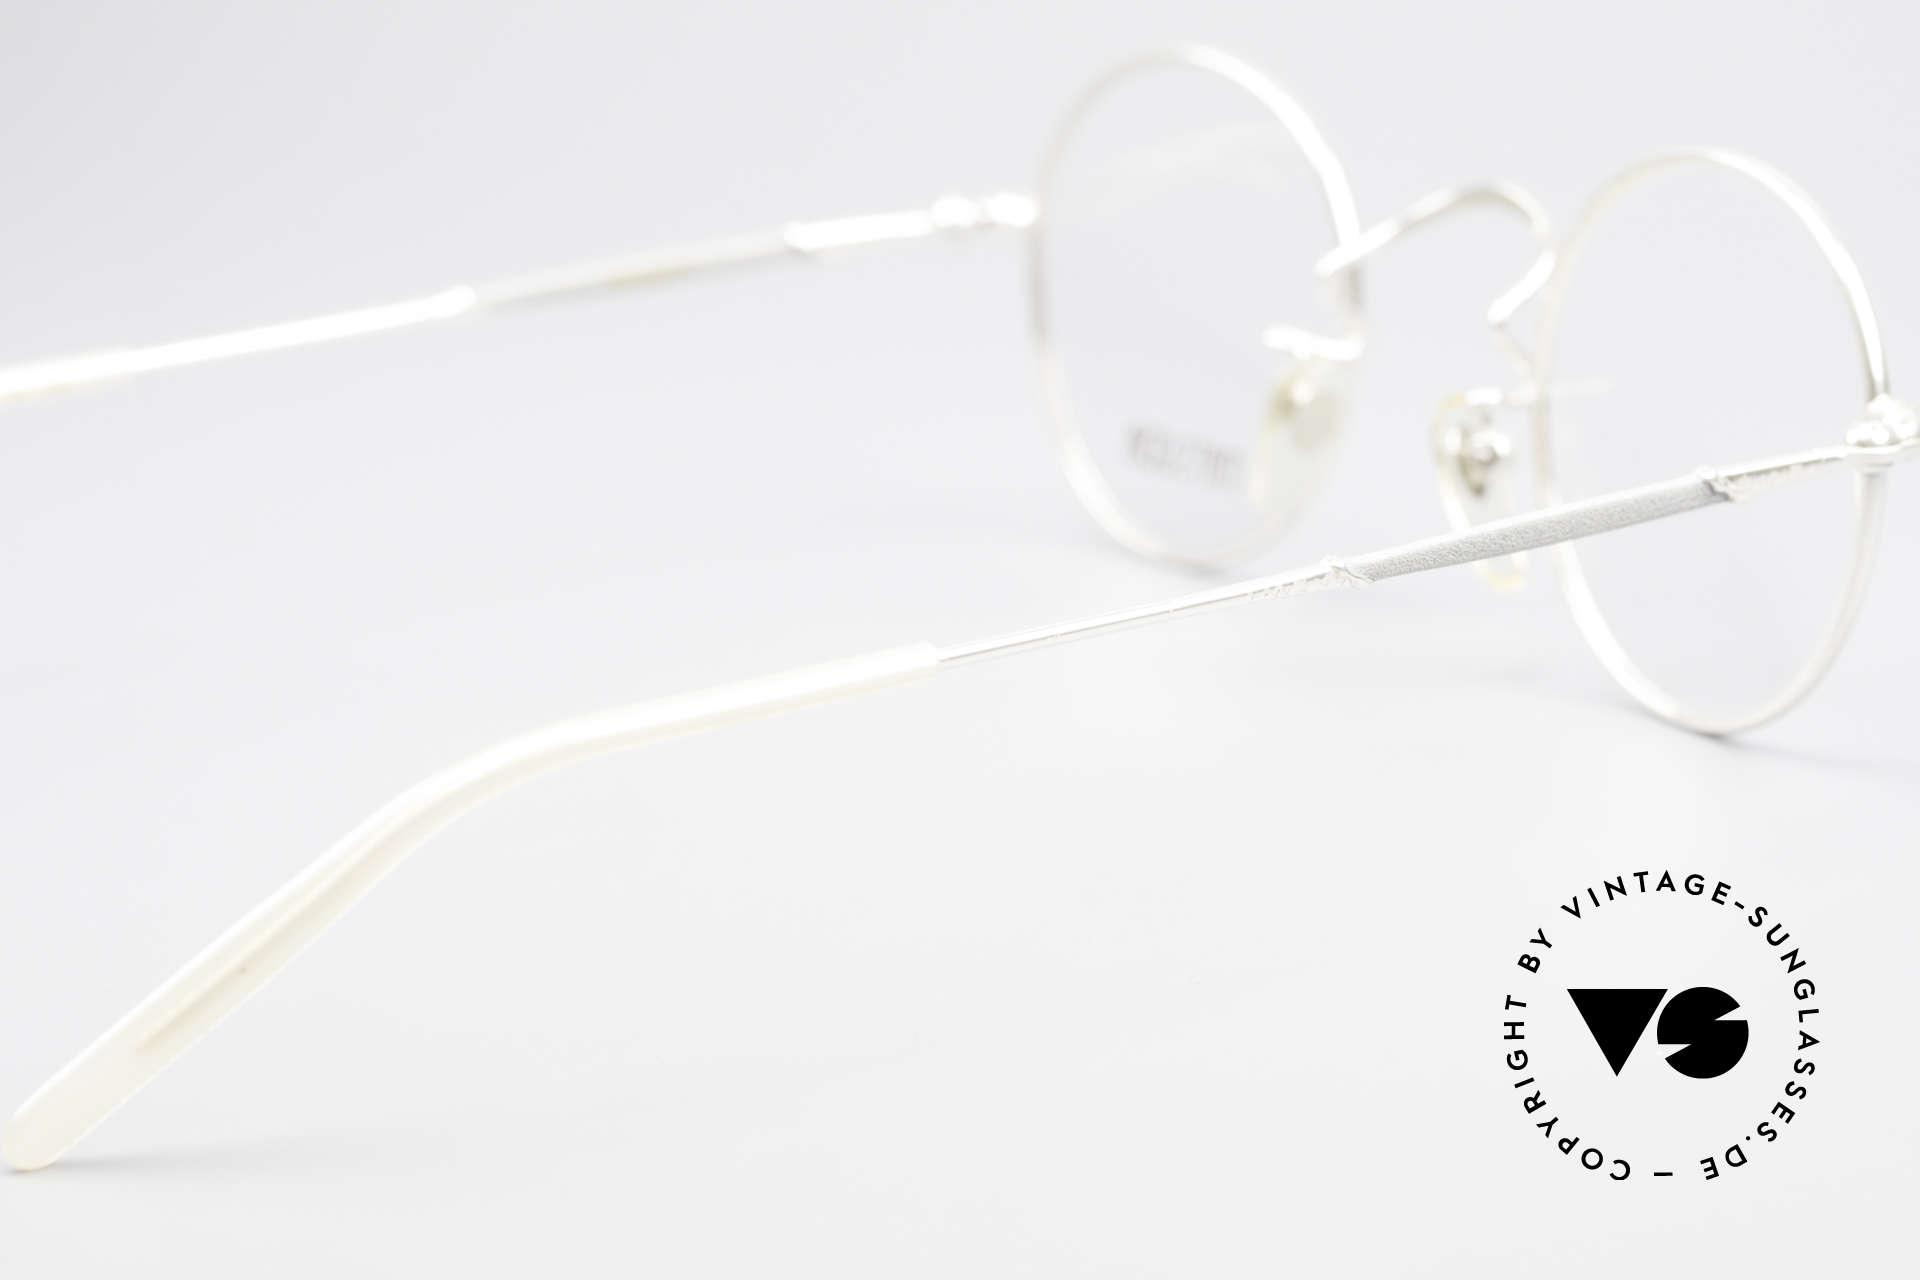 Matsuda 2872 Round 90's Designer Glasses, Size: small, Made for Men and Women